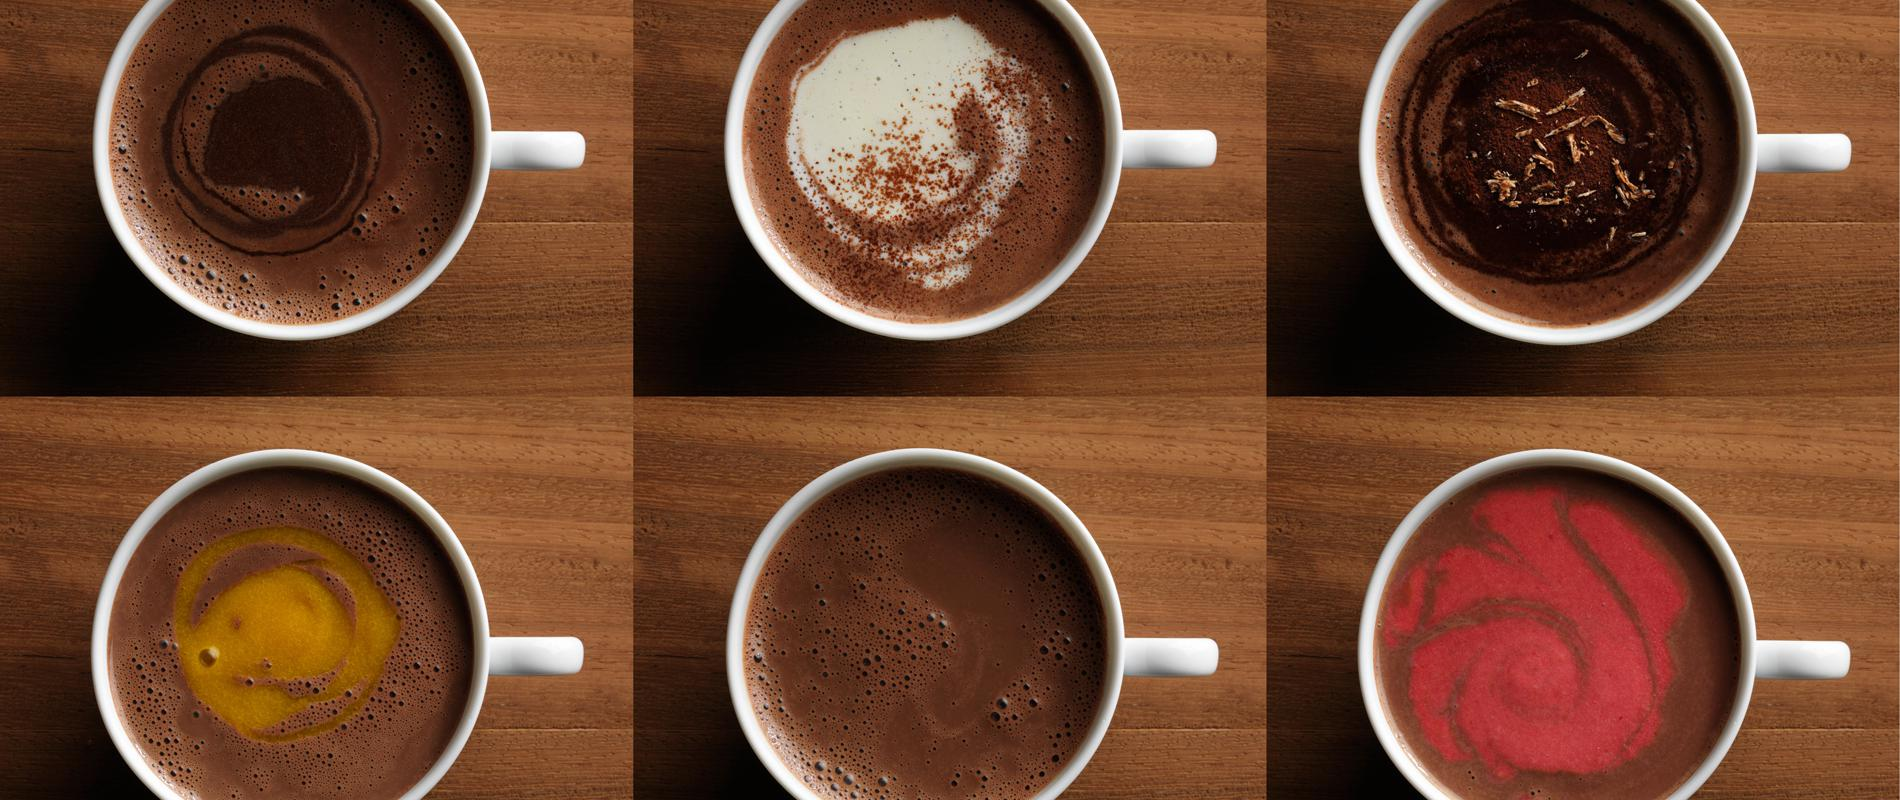 tendance-gourmande--cette-annee-en-cuisine-le-chocolat-sera-chaud-en-cuisine.jpg